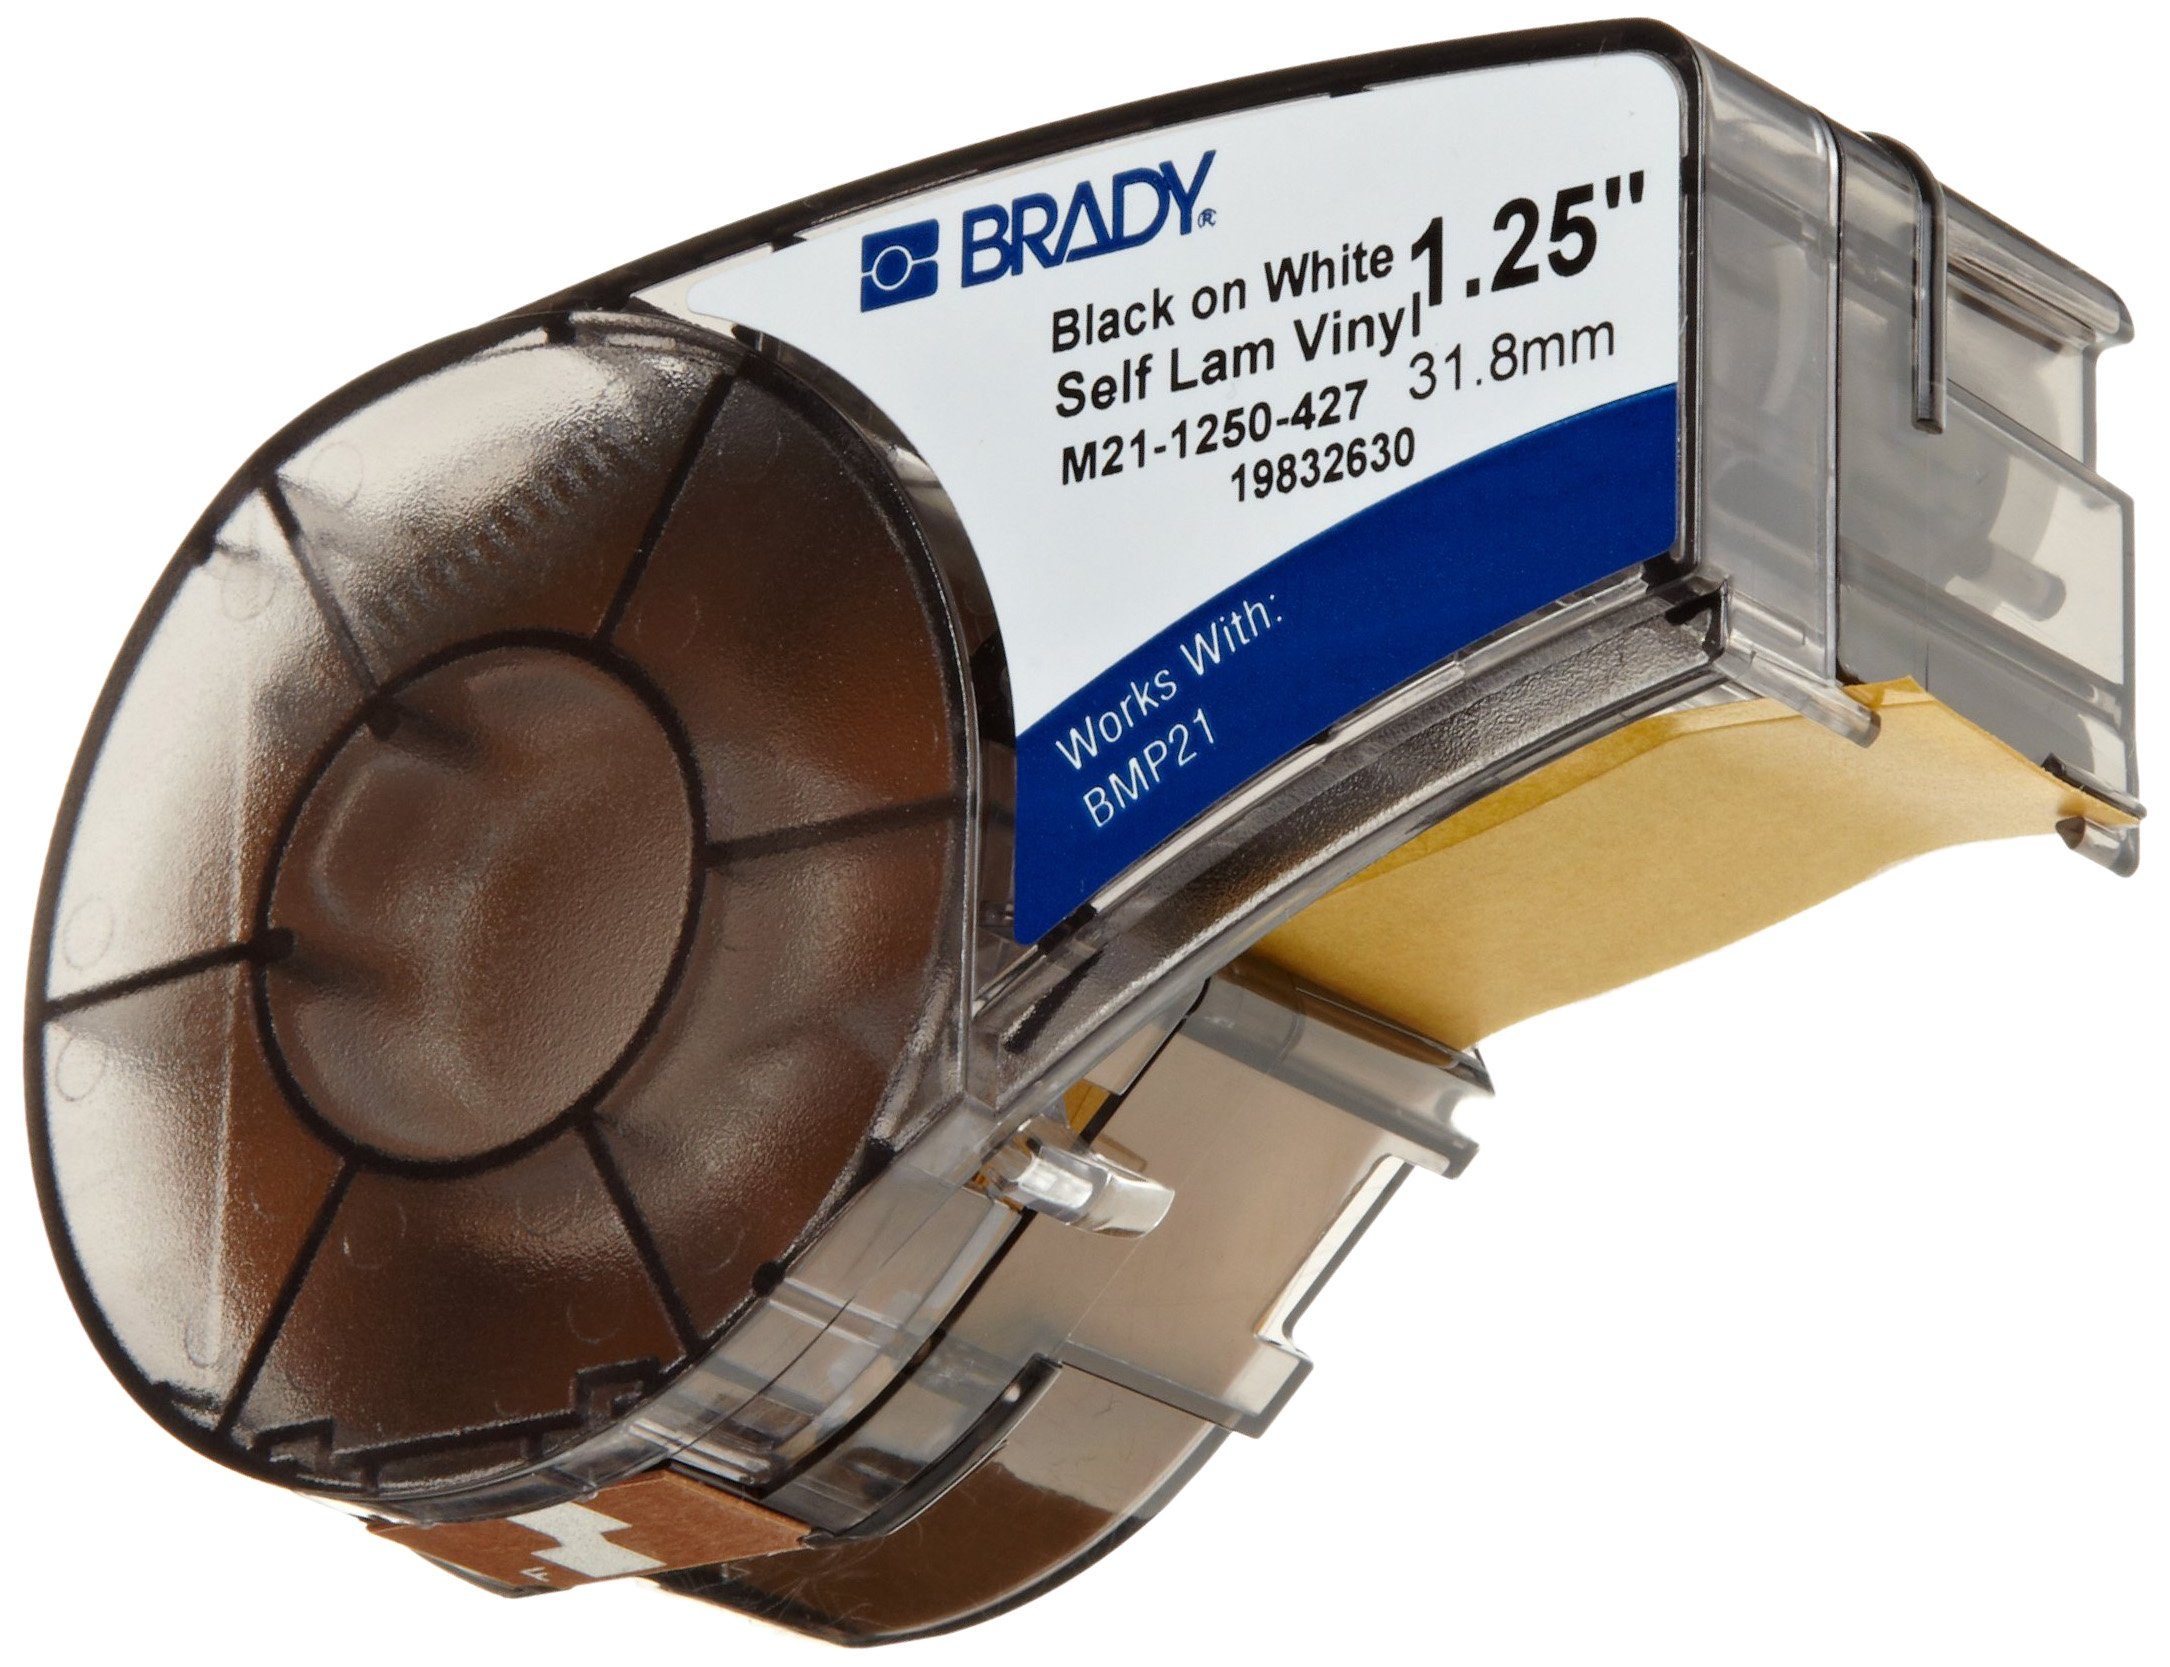 Brady M21-1250-427 14' Length, 1.25'' Width, B-427 Self-Laminating Vinyl, Black On White/Translucent Color BMP 21 Mobile Printer Label